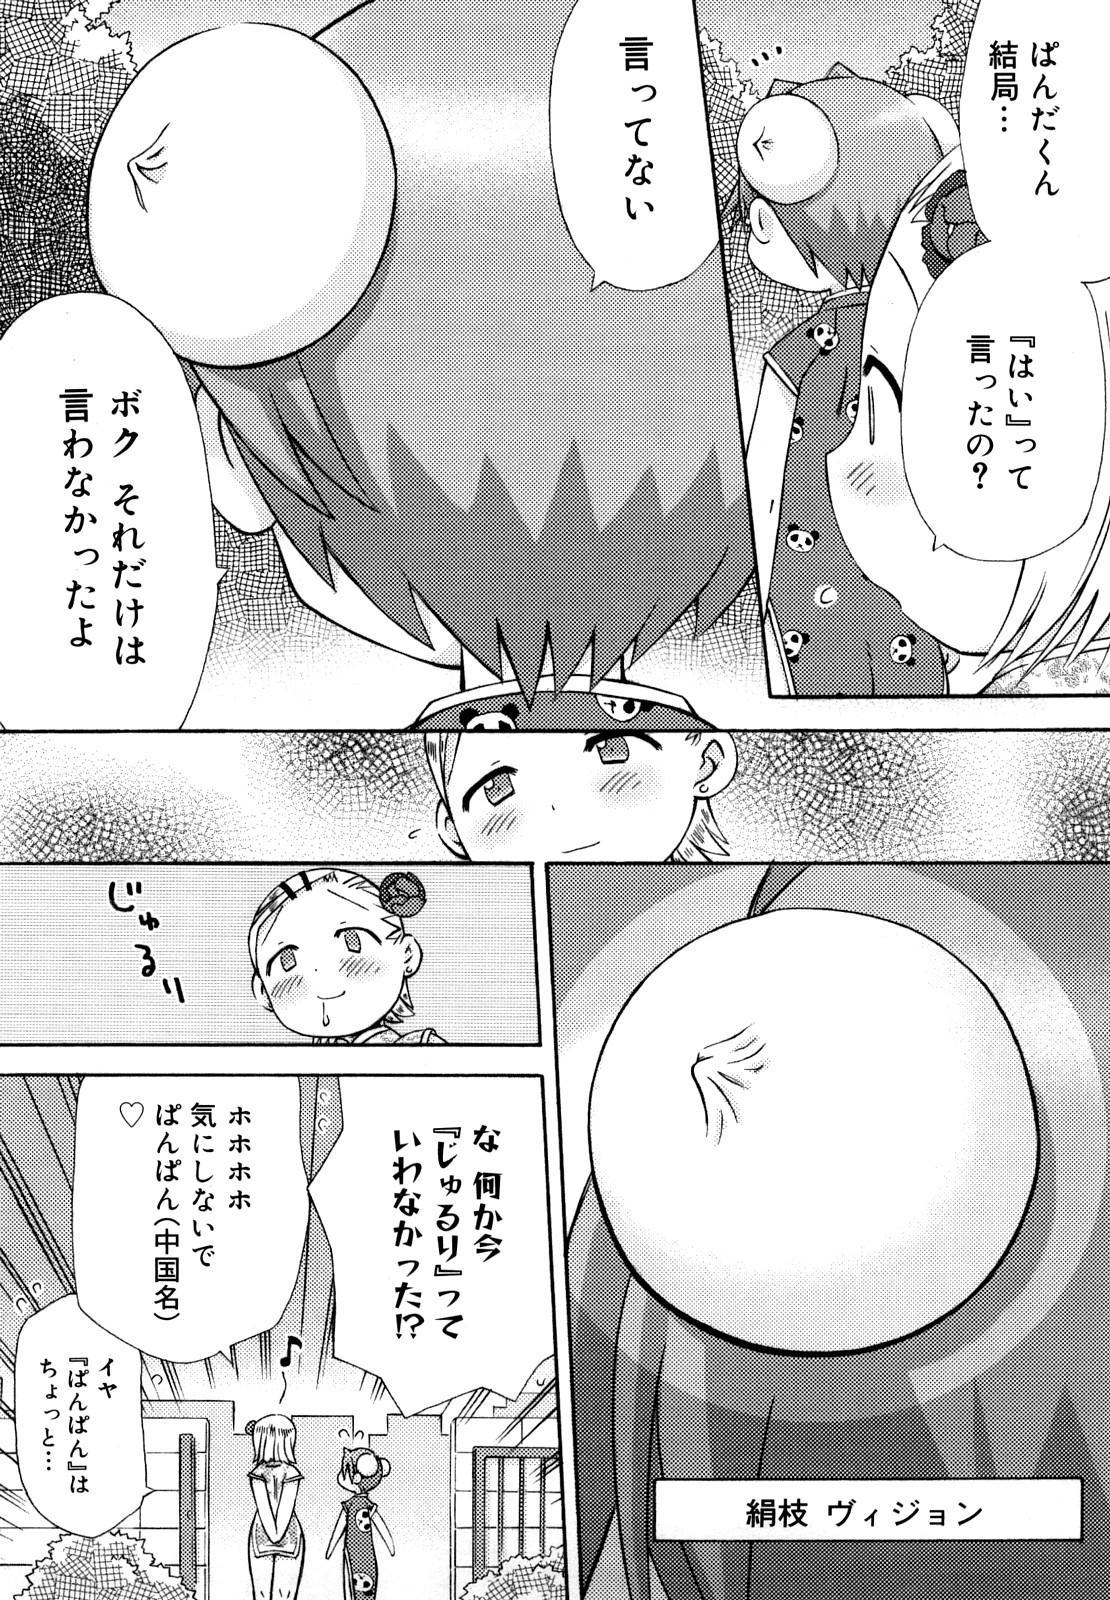 Hatsuden Pandakun! Shinsouban 79